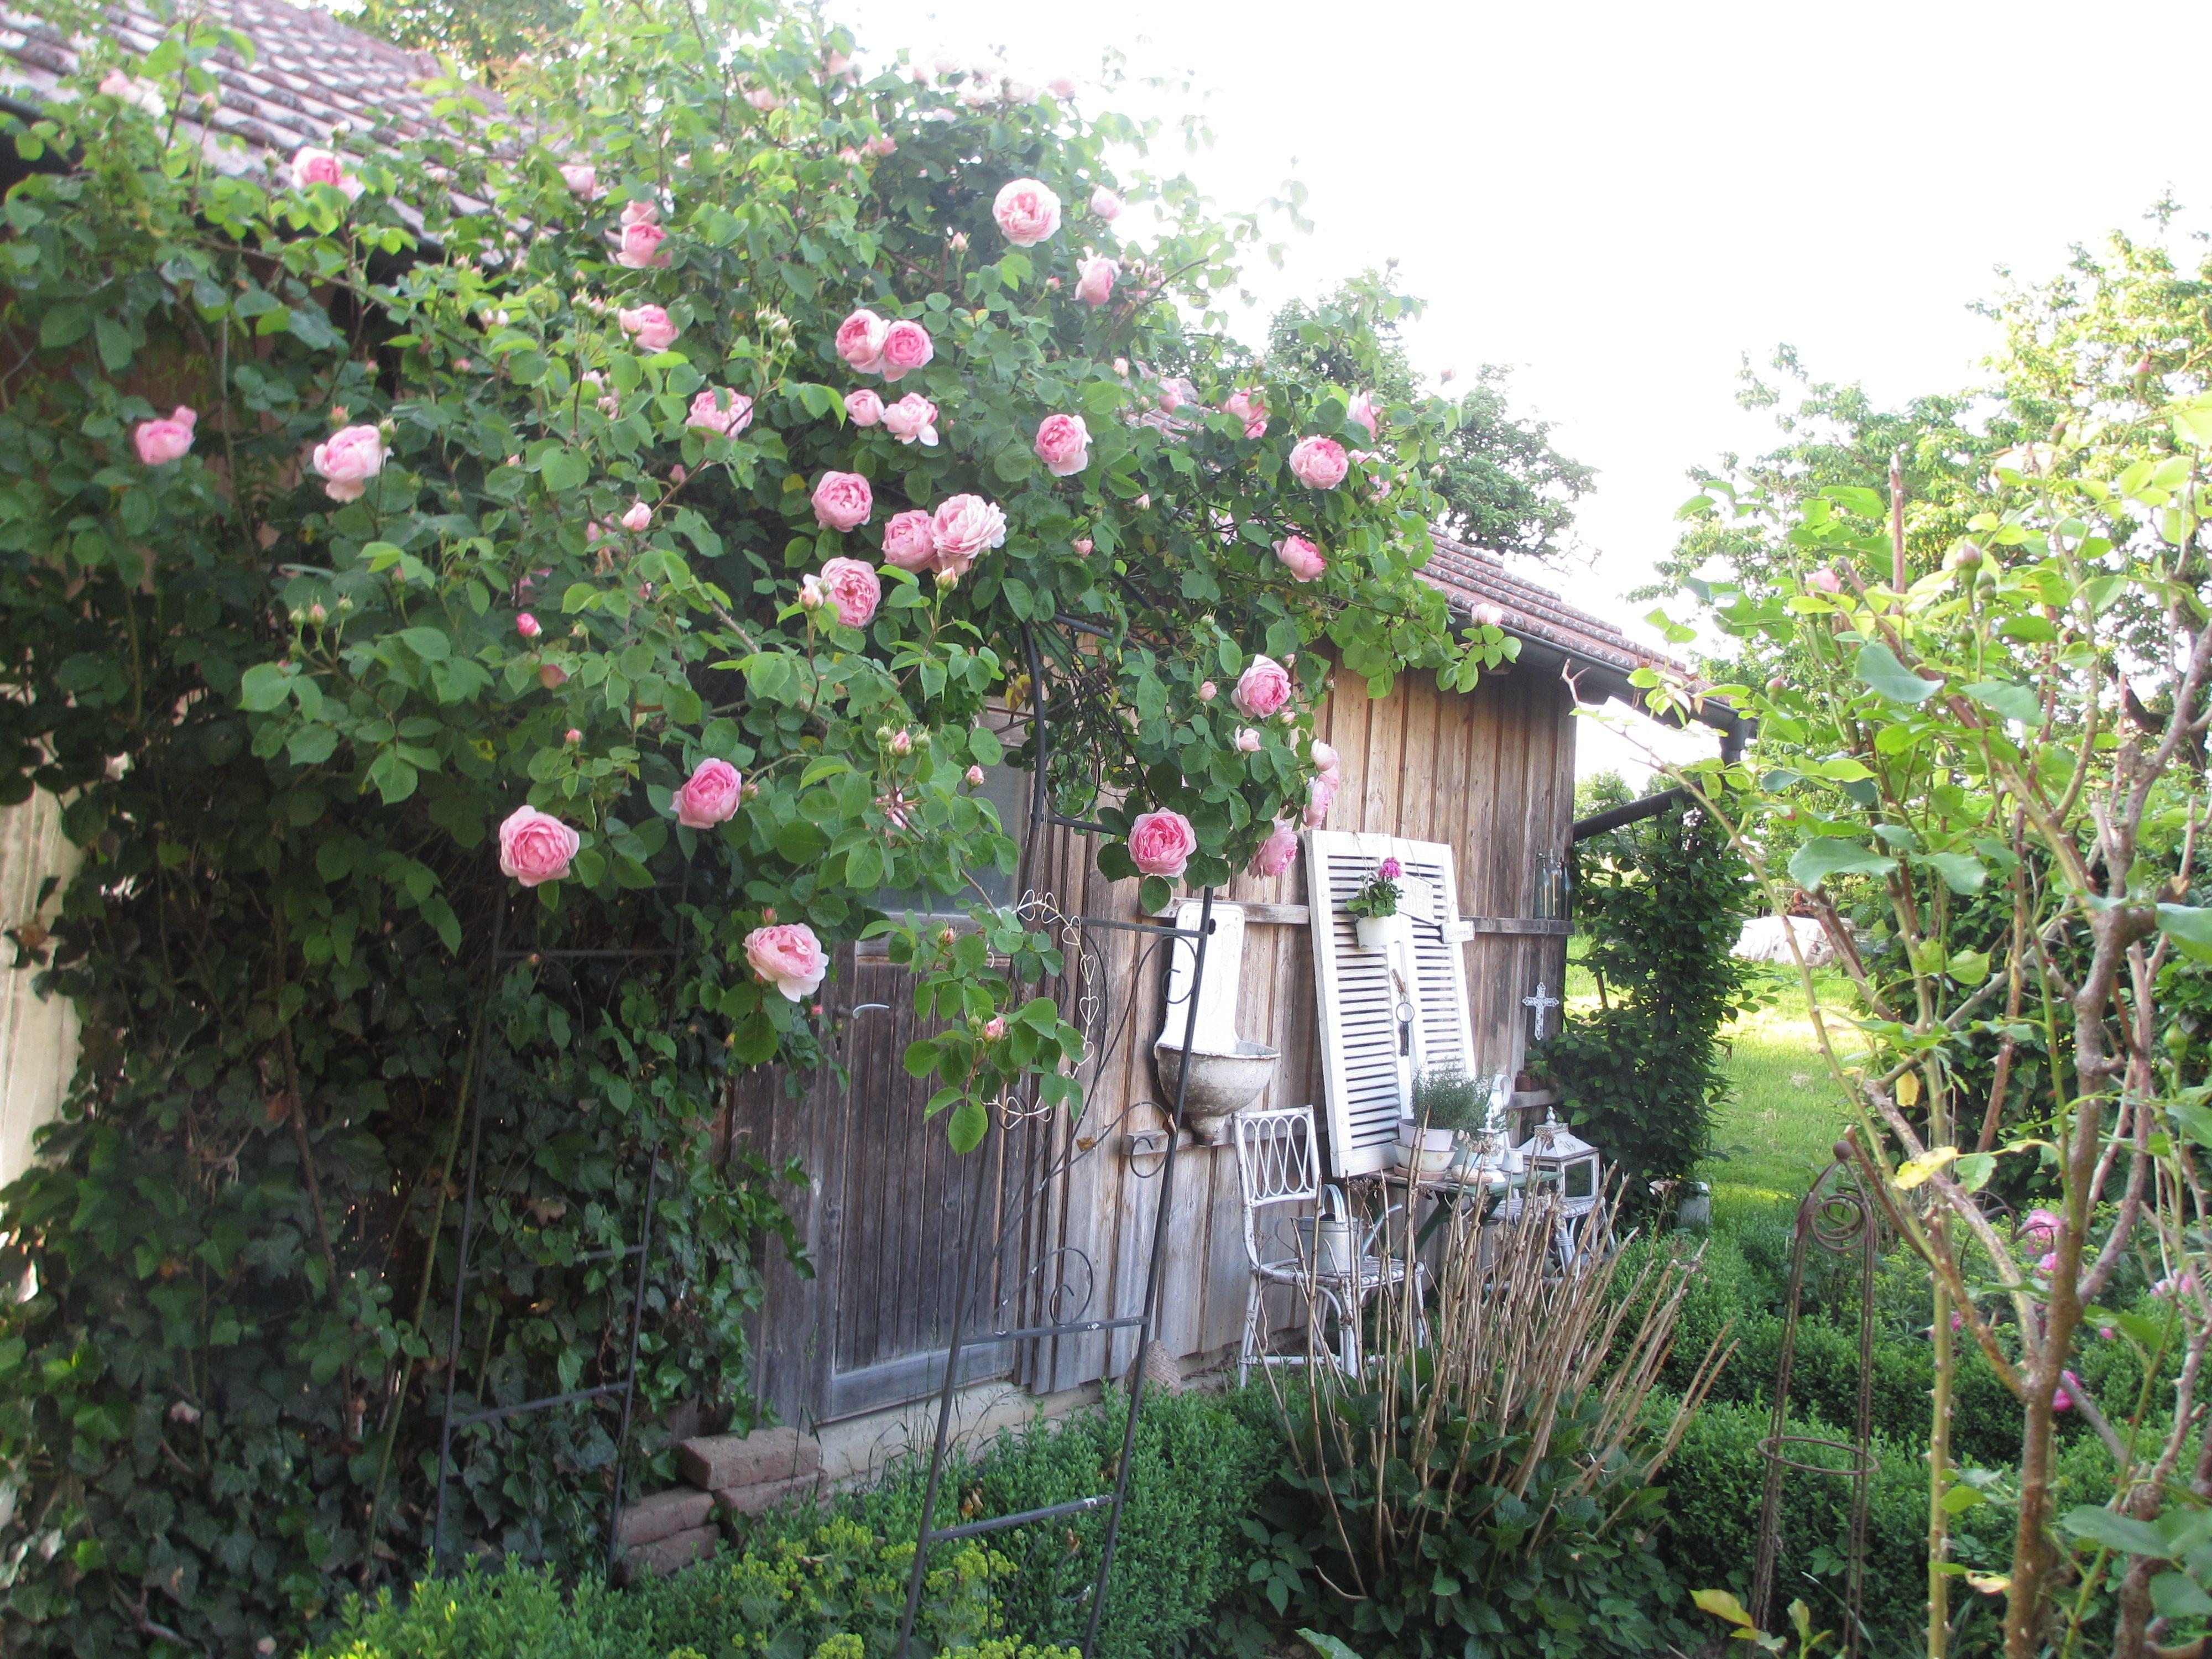 Kletterbogen Garten : Kinderkletterbogen bilder vicht